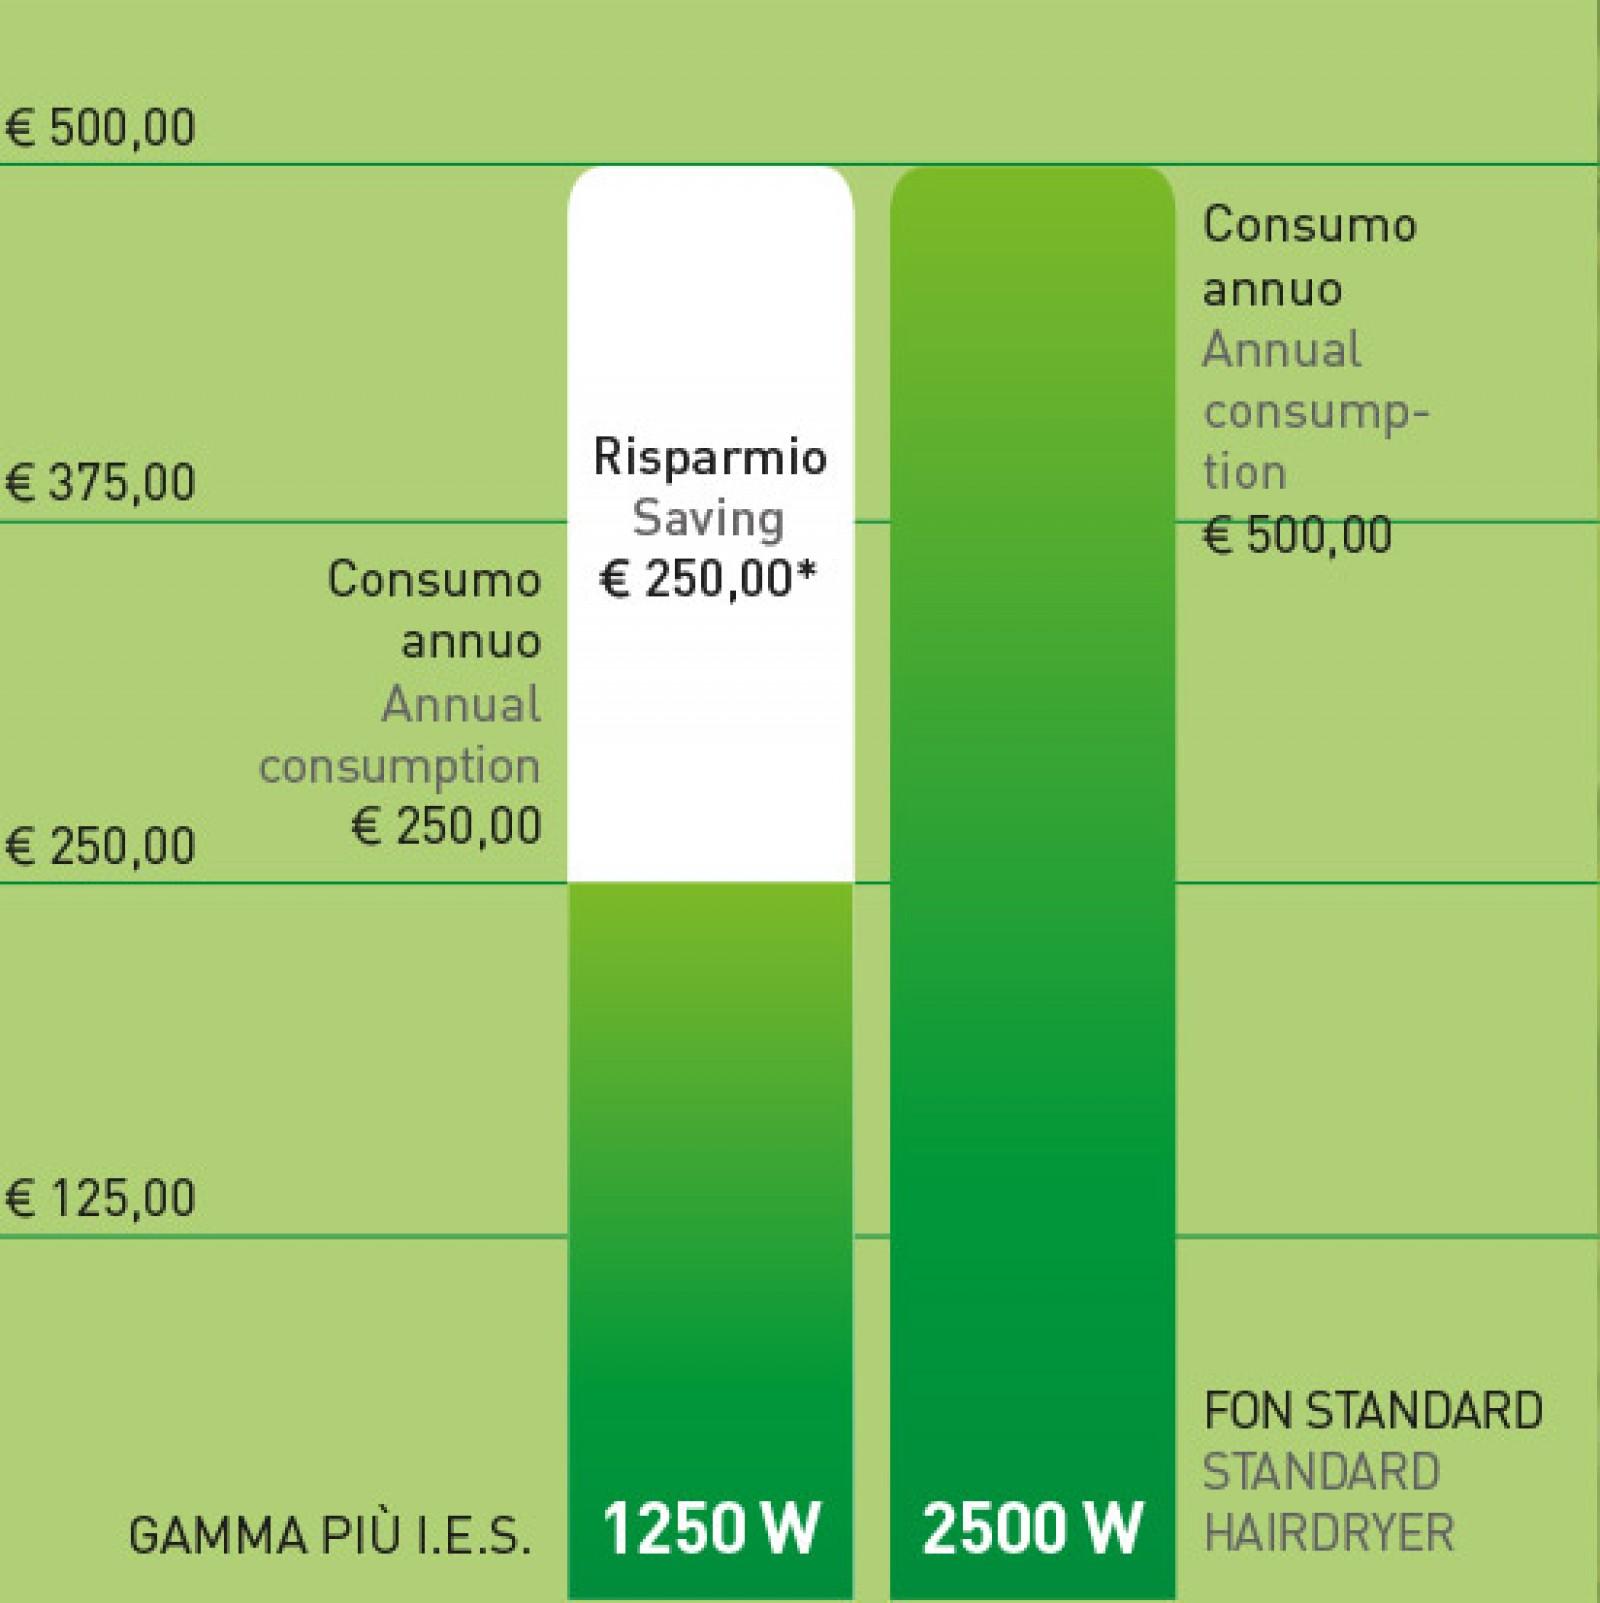 Épargne € 250,00